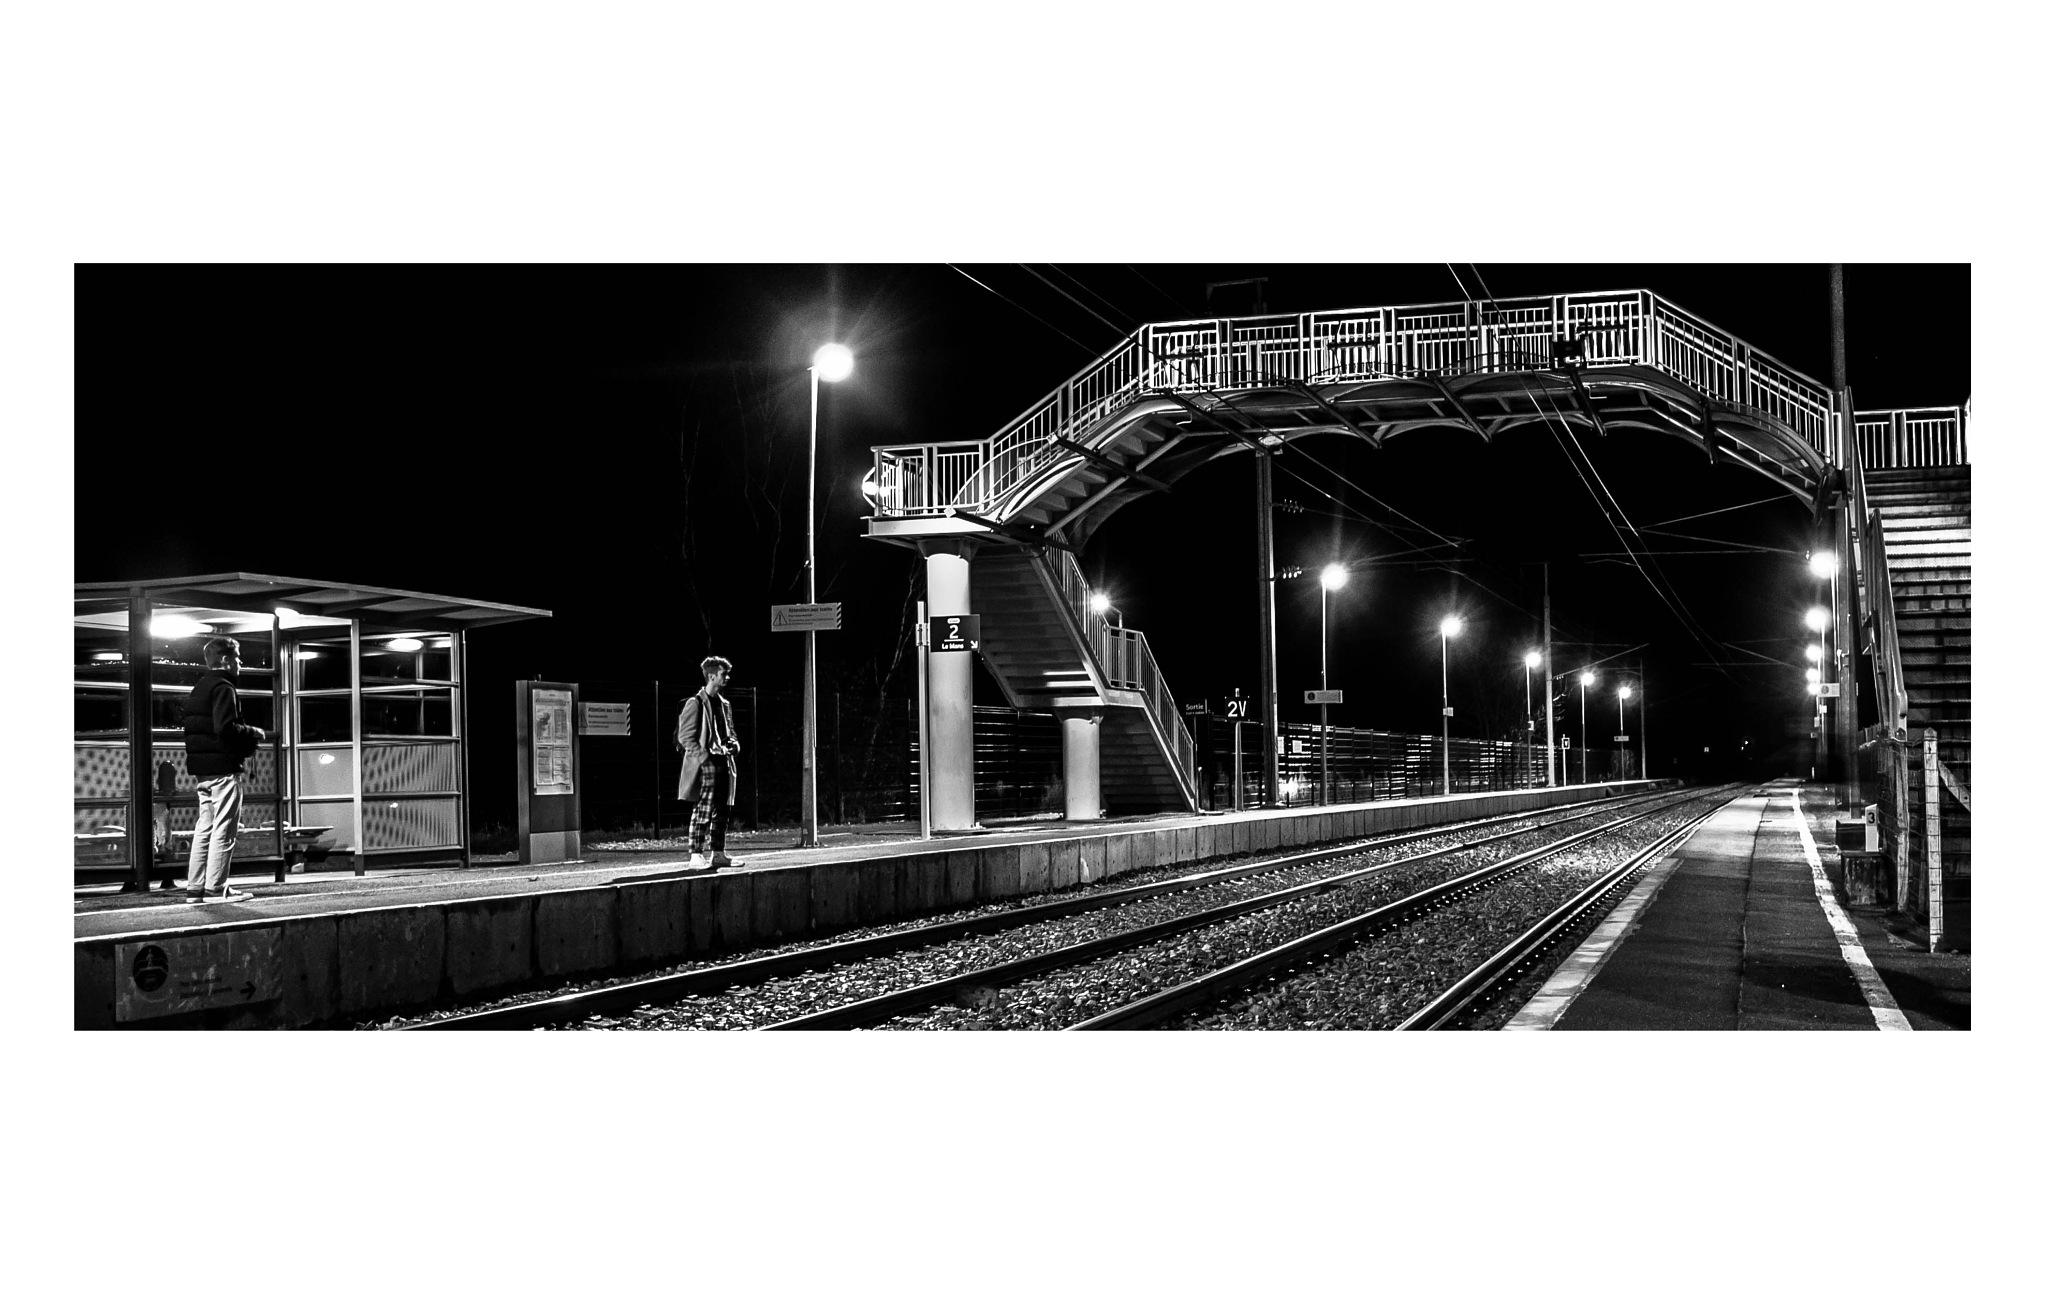 train station by night  by SimonALLIBABA